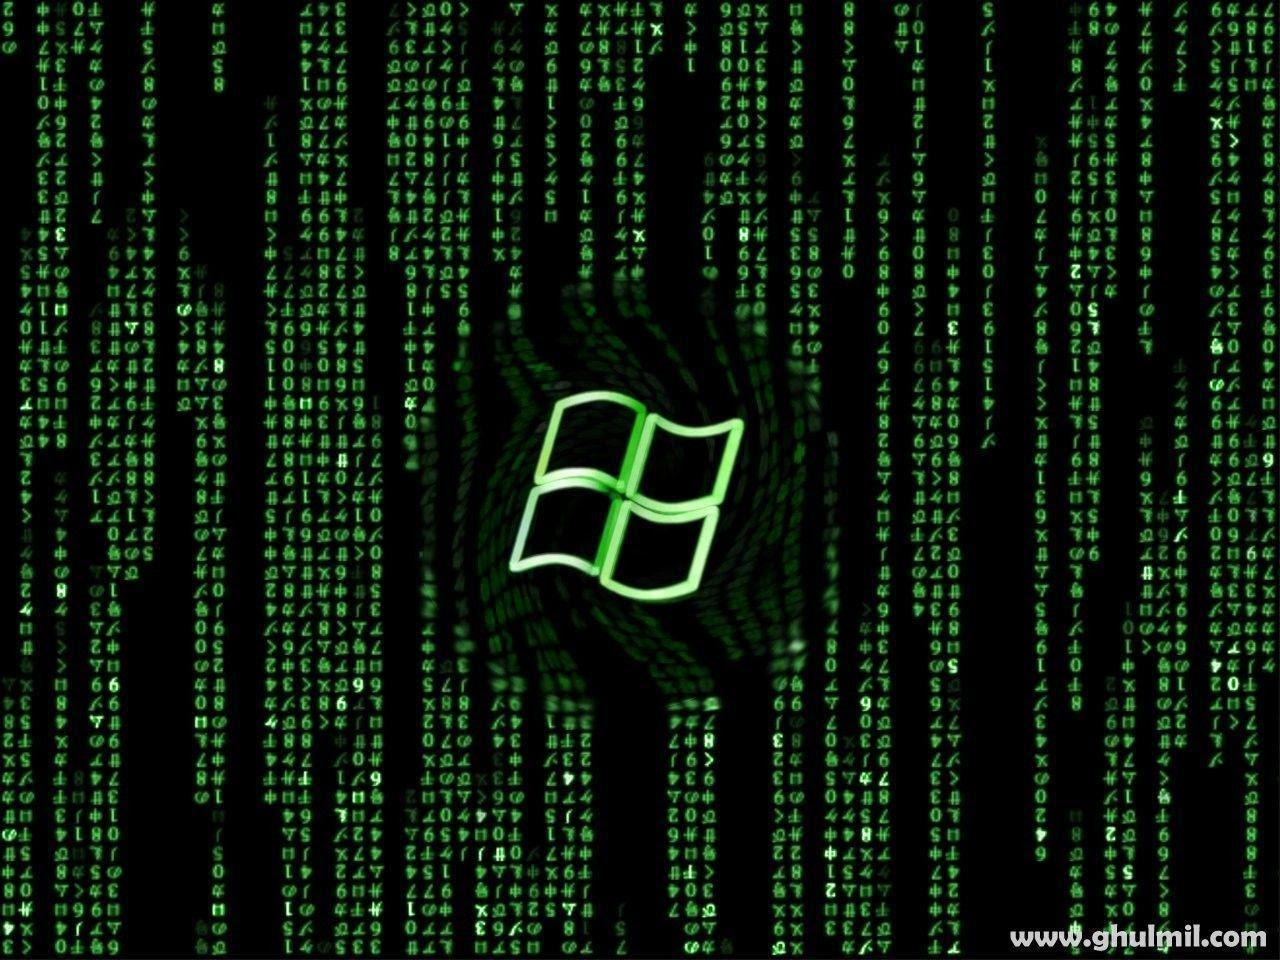 76 Gambar Animasi Hacker Bergerak Terbaik